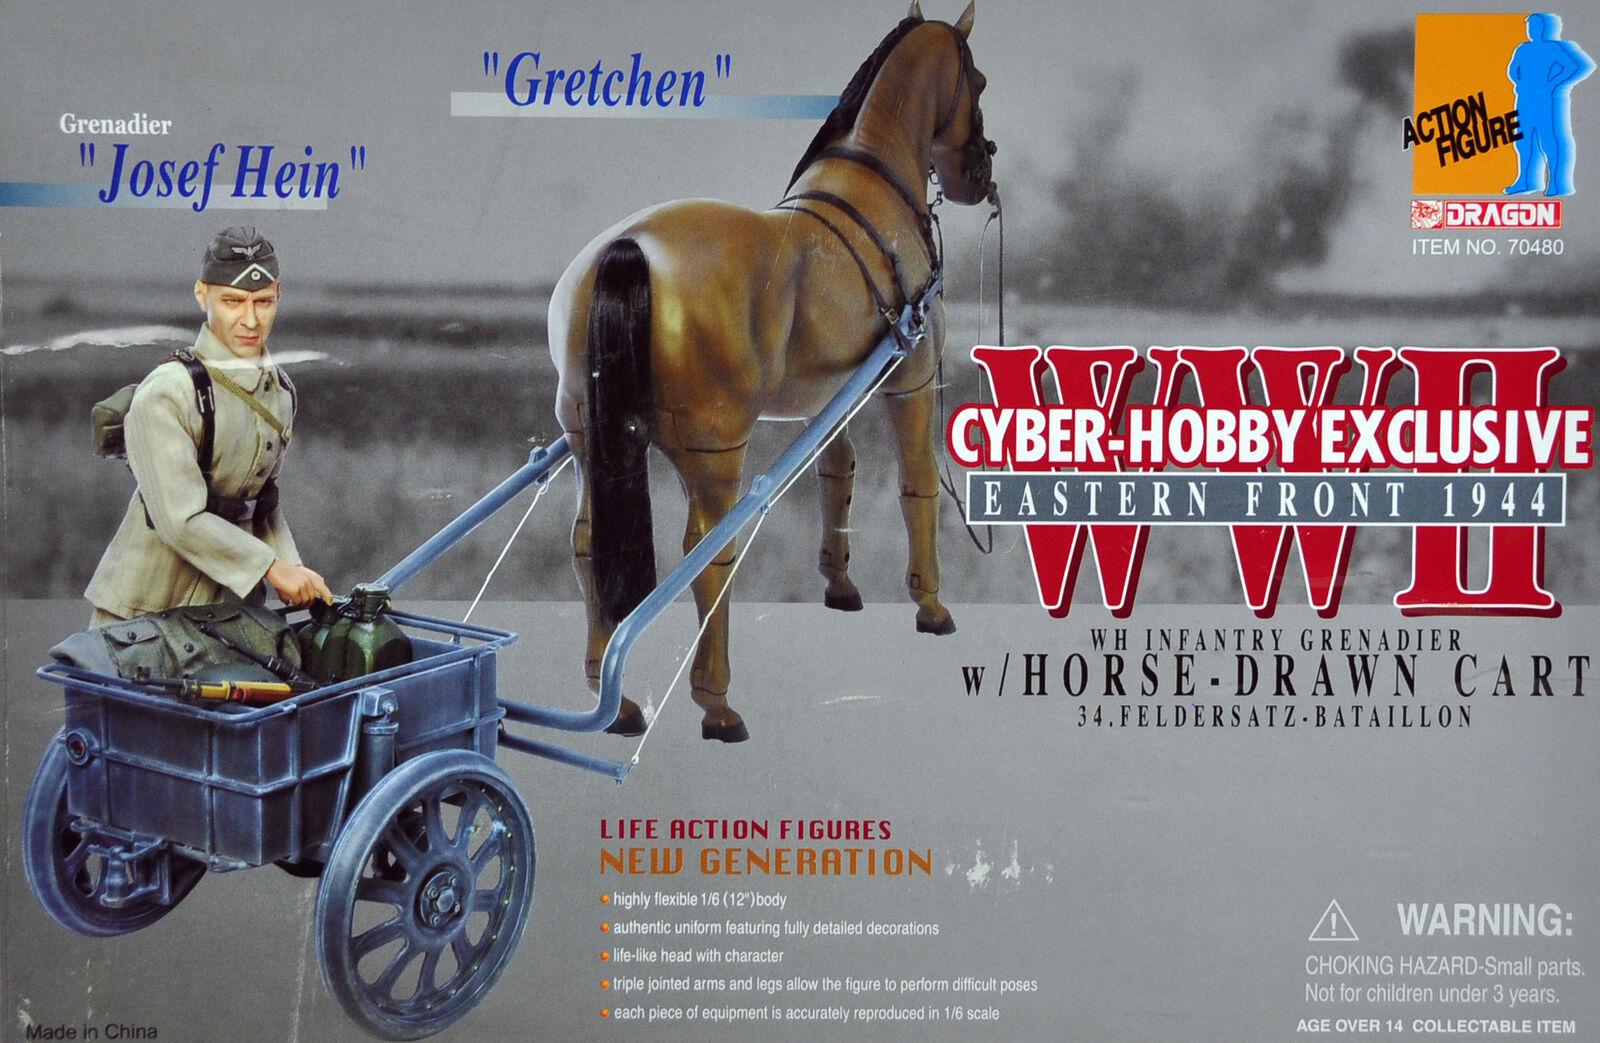 Cyber Hobby Exclusive Dragon WWII German Grenadier w Horse Drawn Cart 70480 1943